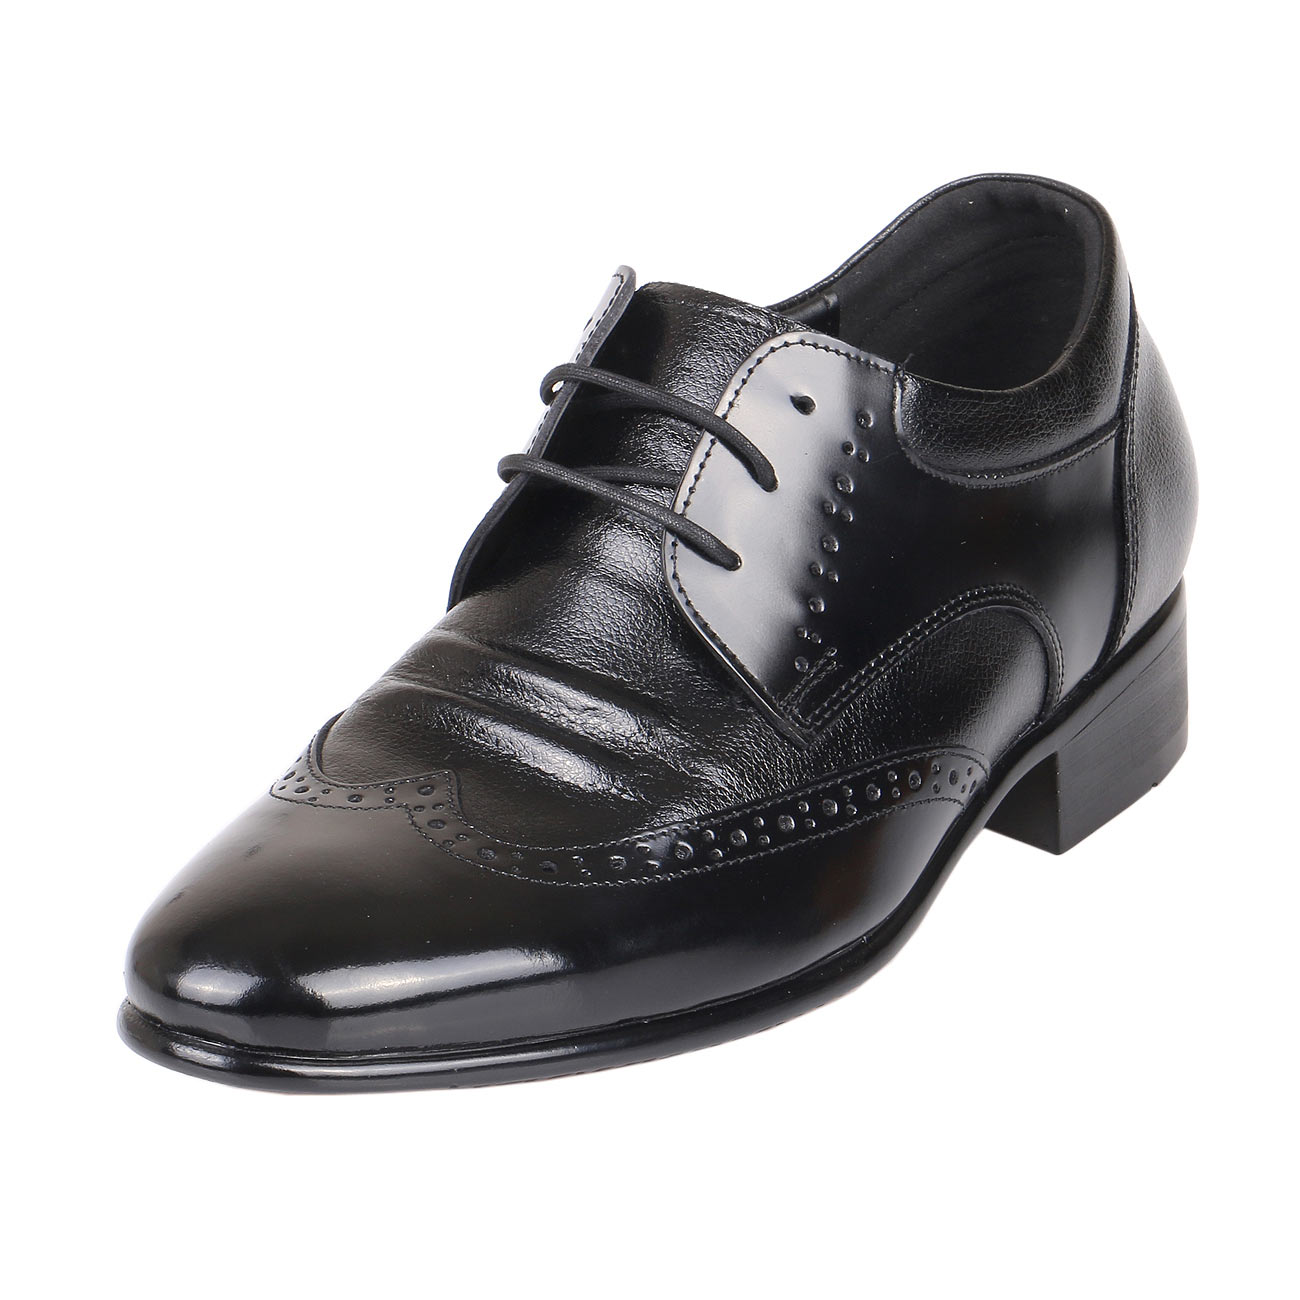 Men's High Increasing Heels 2.4 Tall, KL636BL